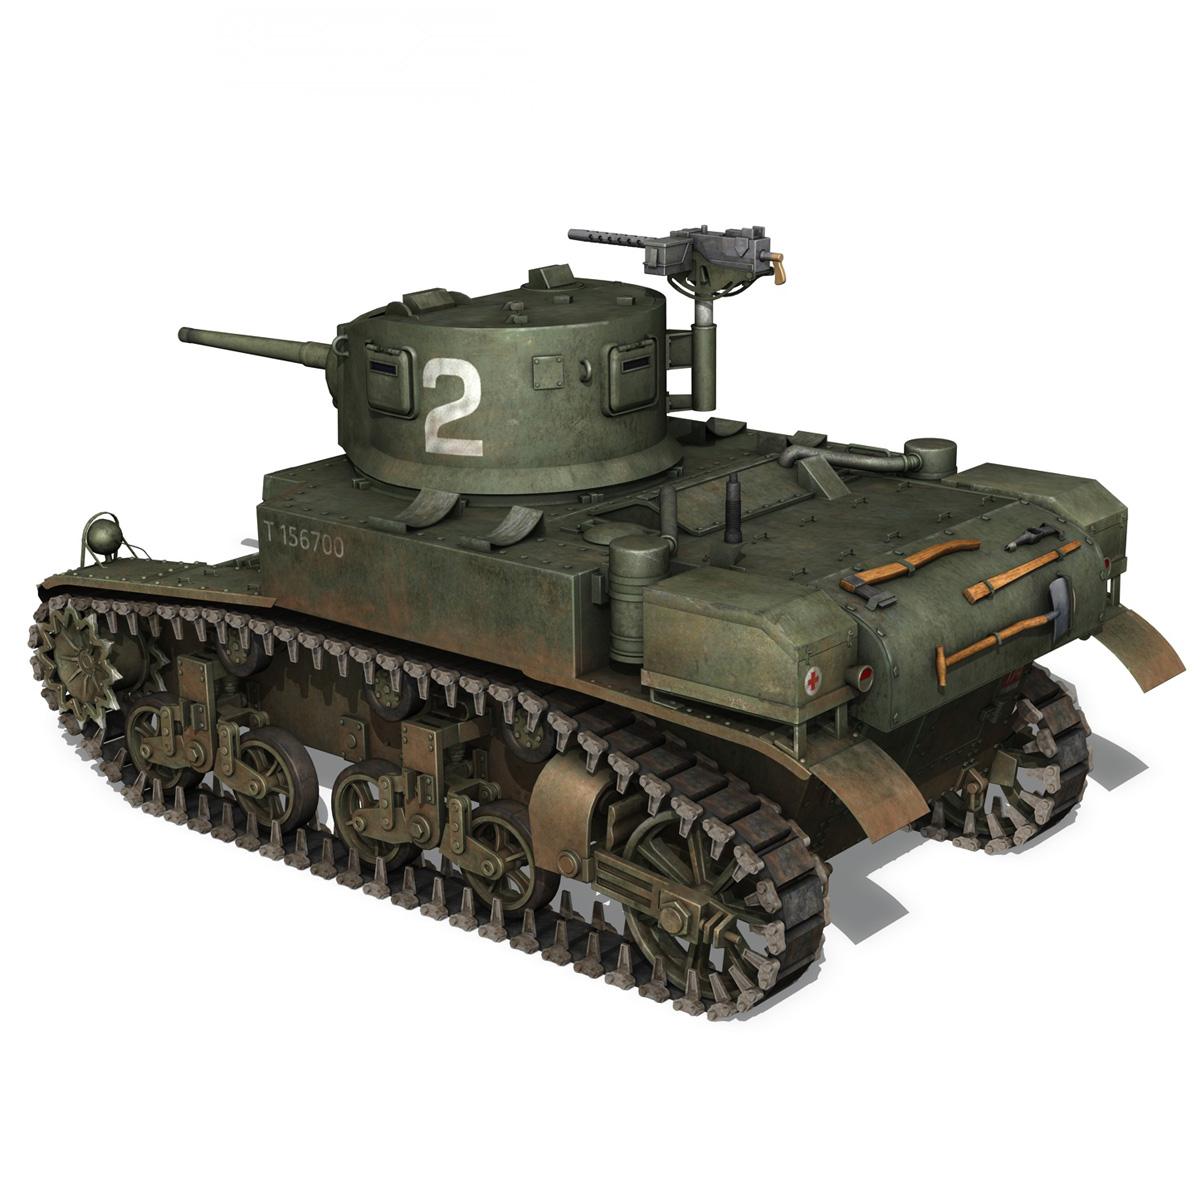 m3a1 light tank stuart – 156700 3d model c4d fbx lwo lw lws obj 3ds 265339